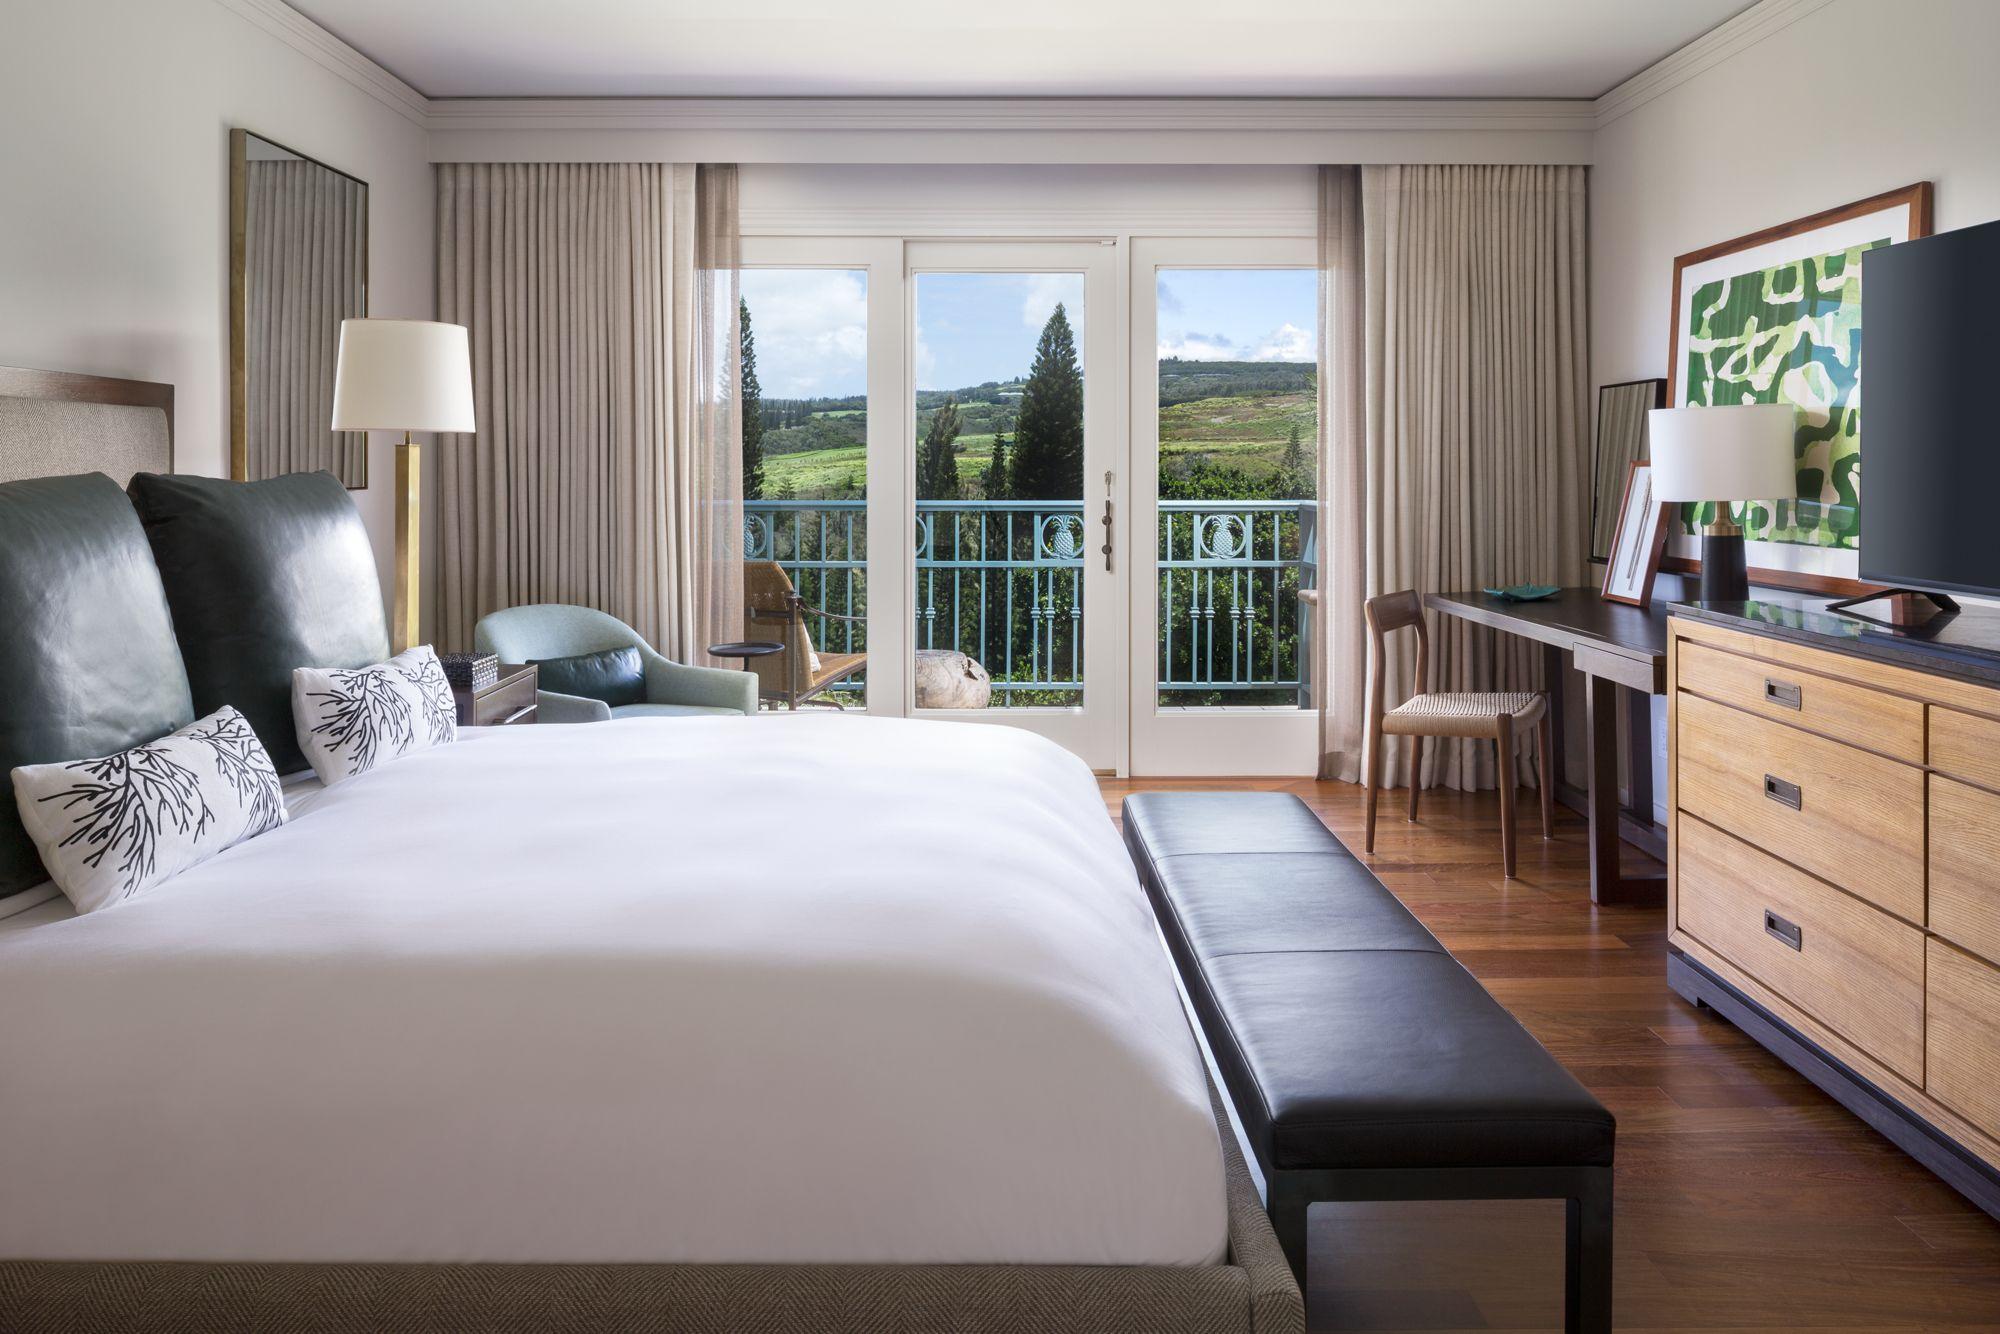 The Ritz-Carlton, Kapalua image 5